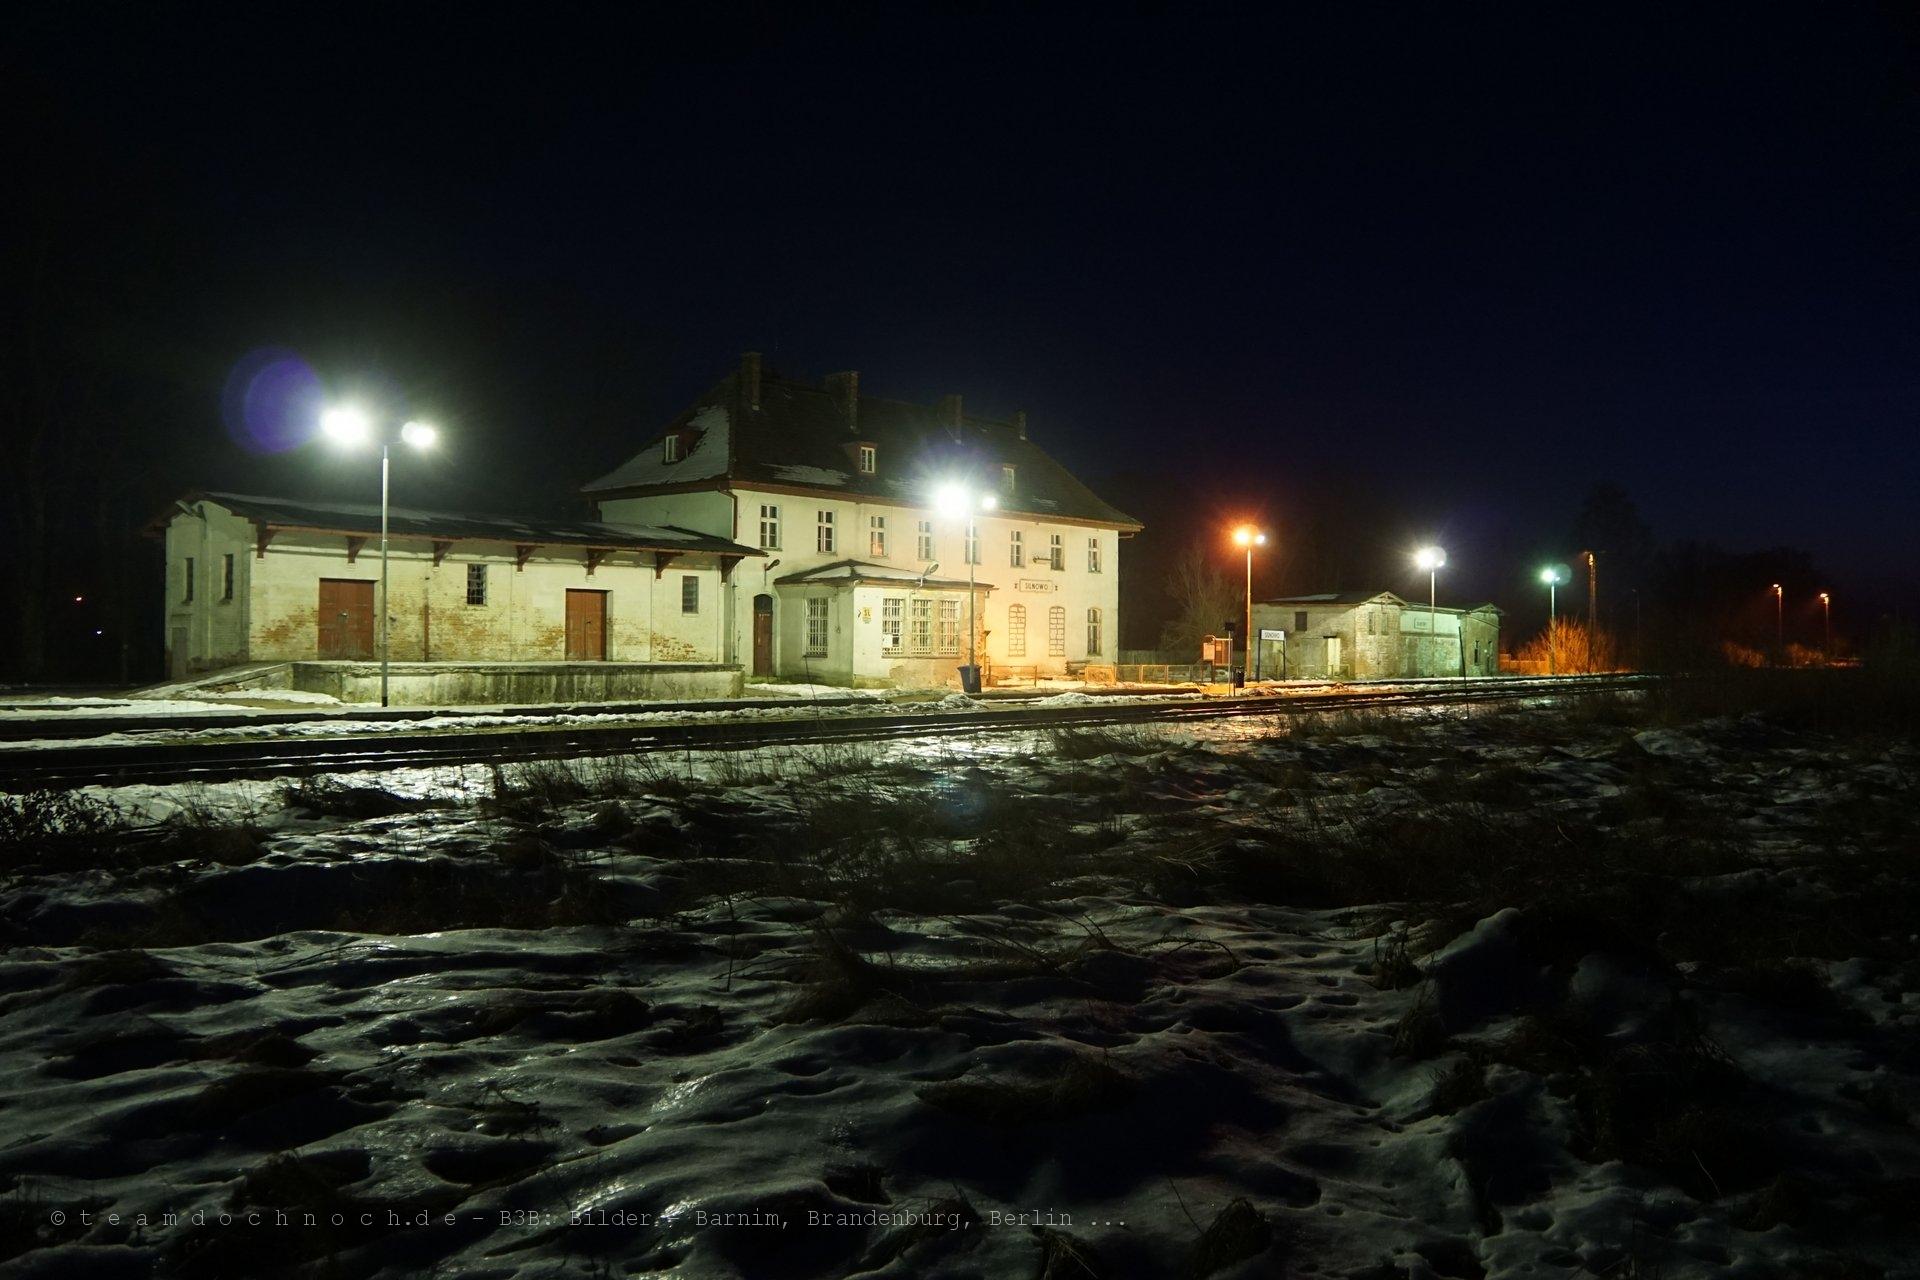 Bahnhof Silnowo